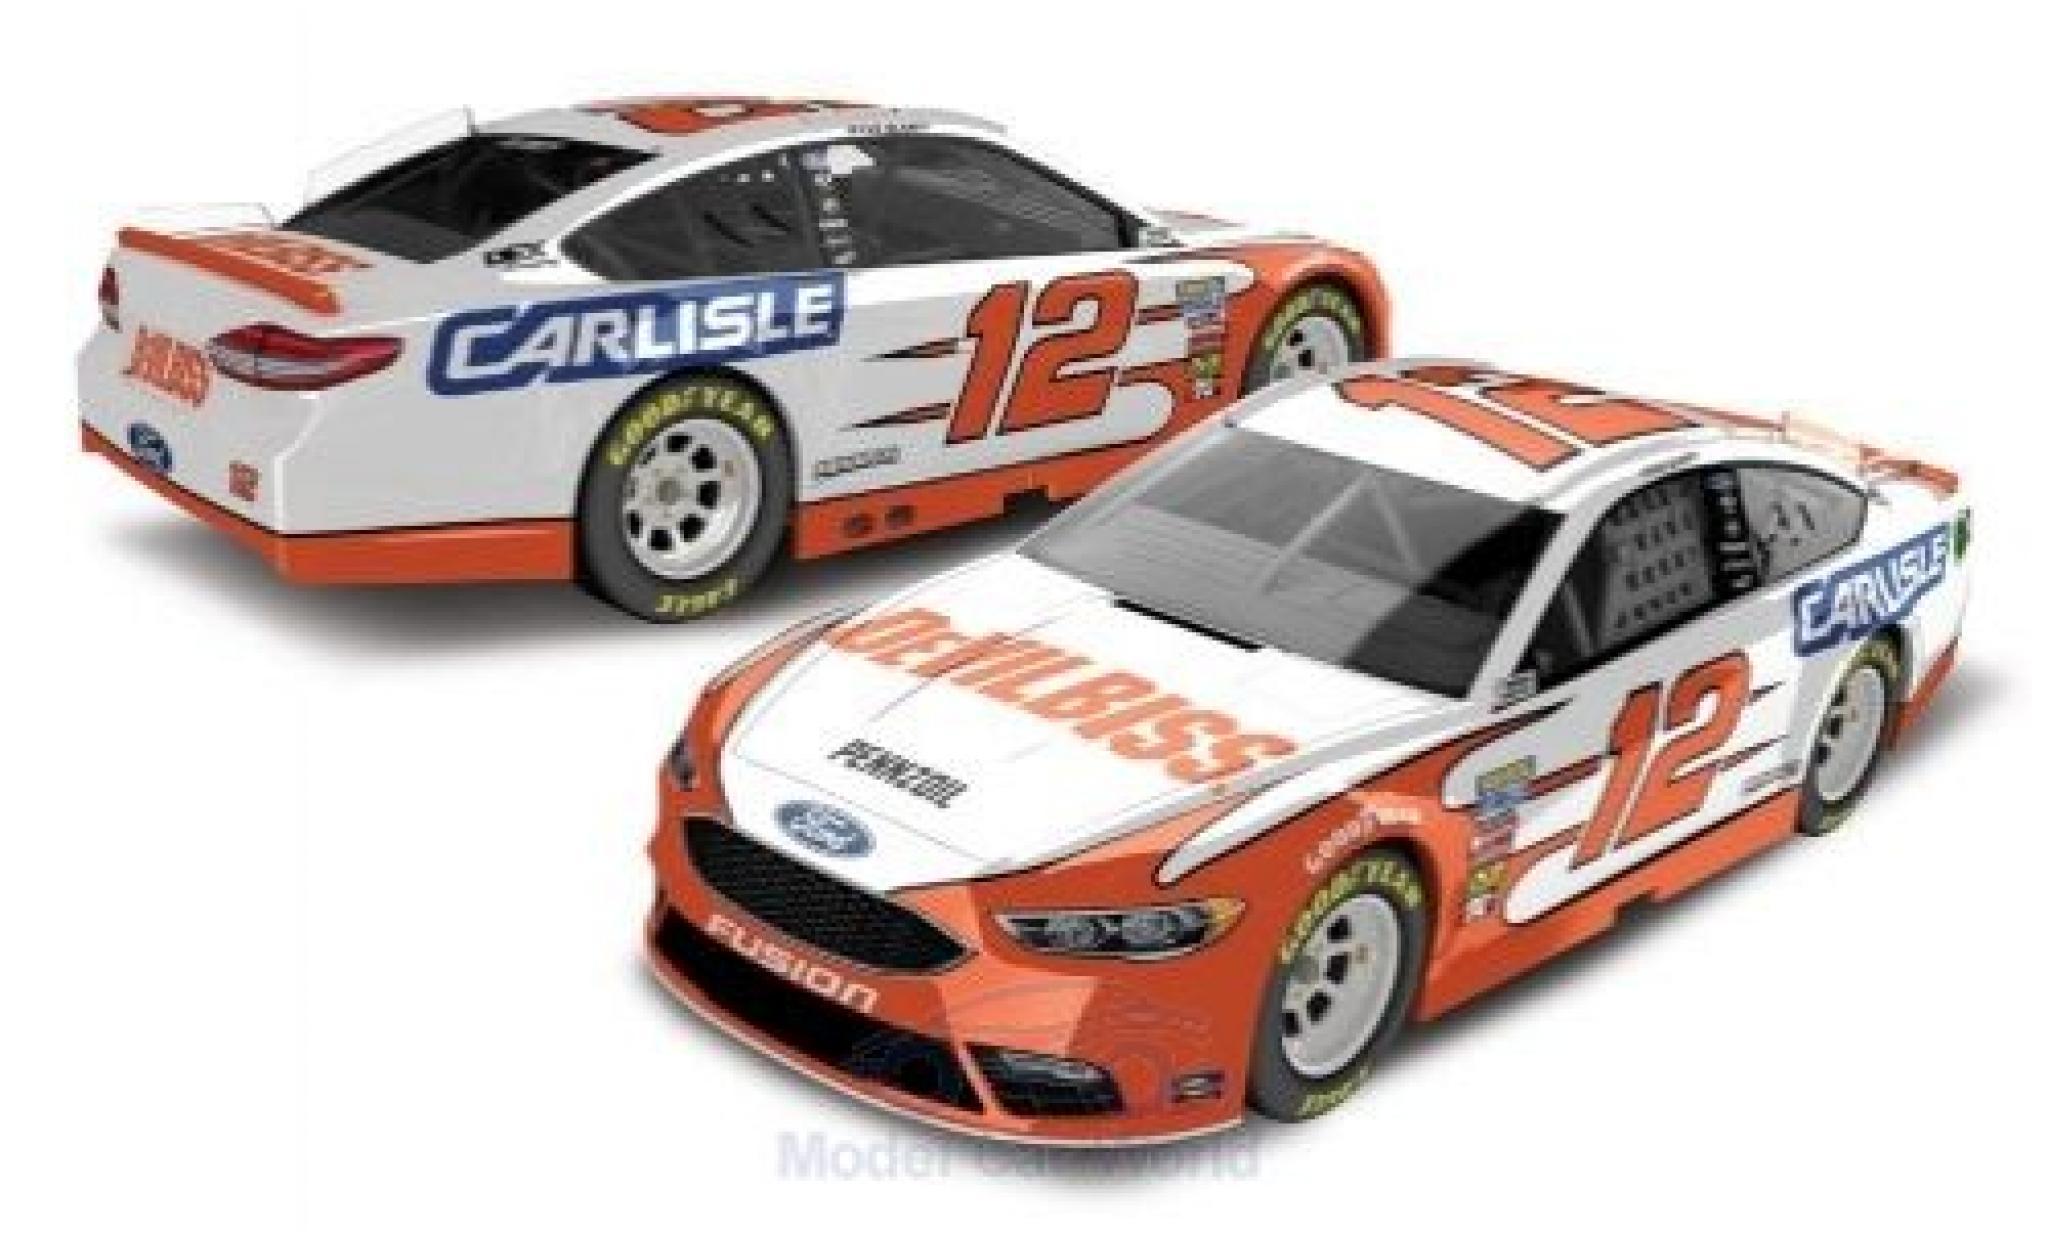 Ford Fusion 1/64 Lionel Racing No.12 Team Penske Carlisle Nascar 2018 R.Blaney